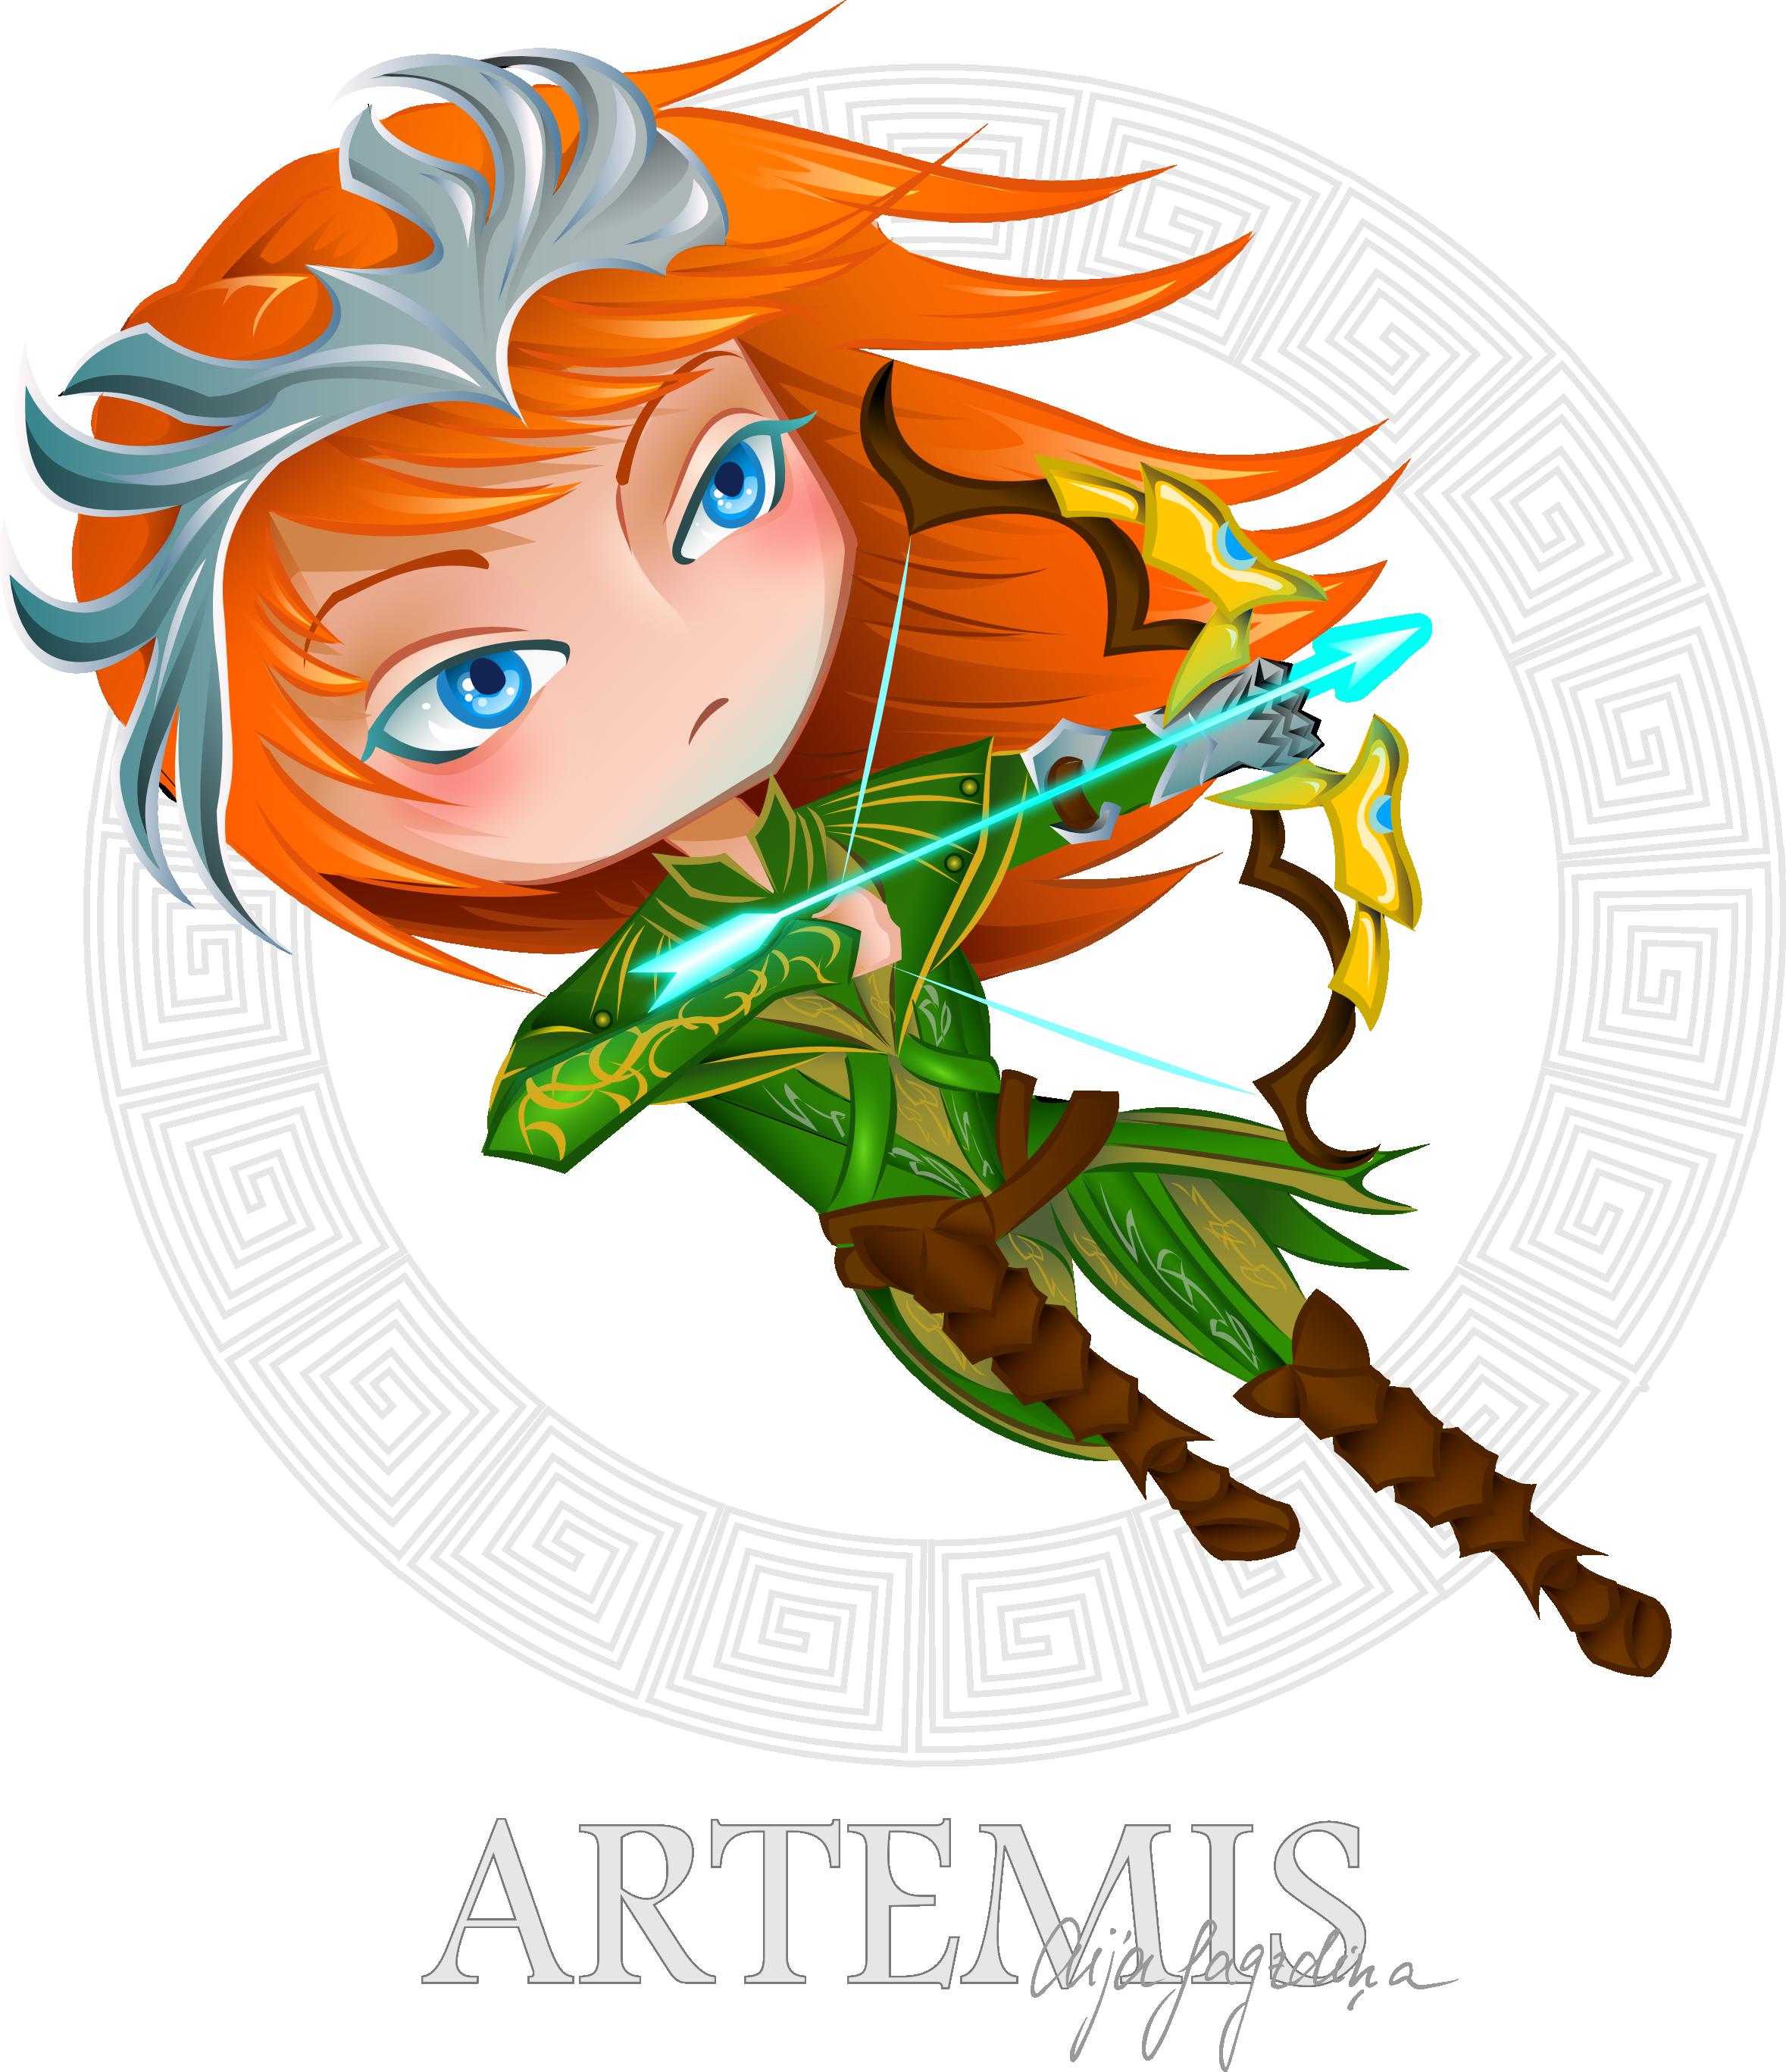 Artemis - Smite fanart by chirkucis.deviantart clipartlook.com on @DeviantArt